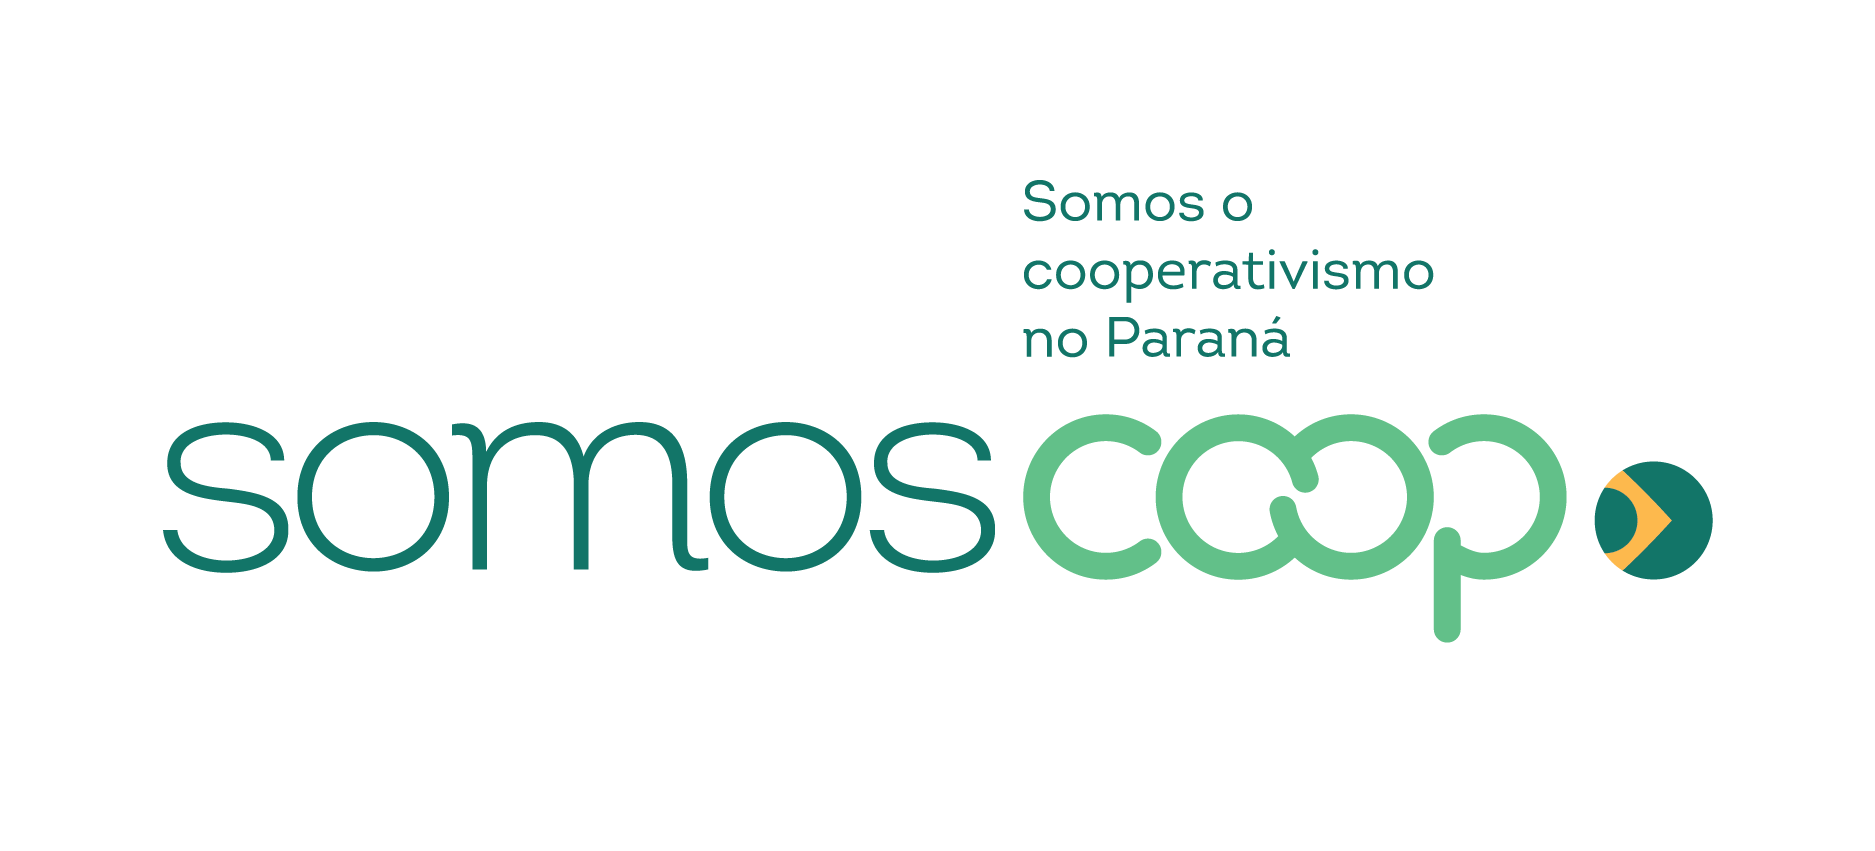 somoscoop 05 04 2019